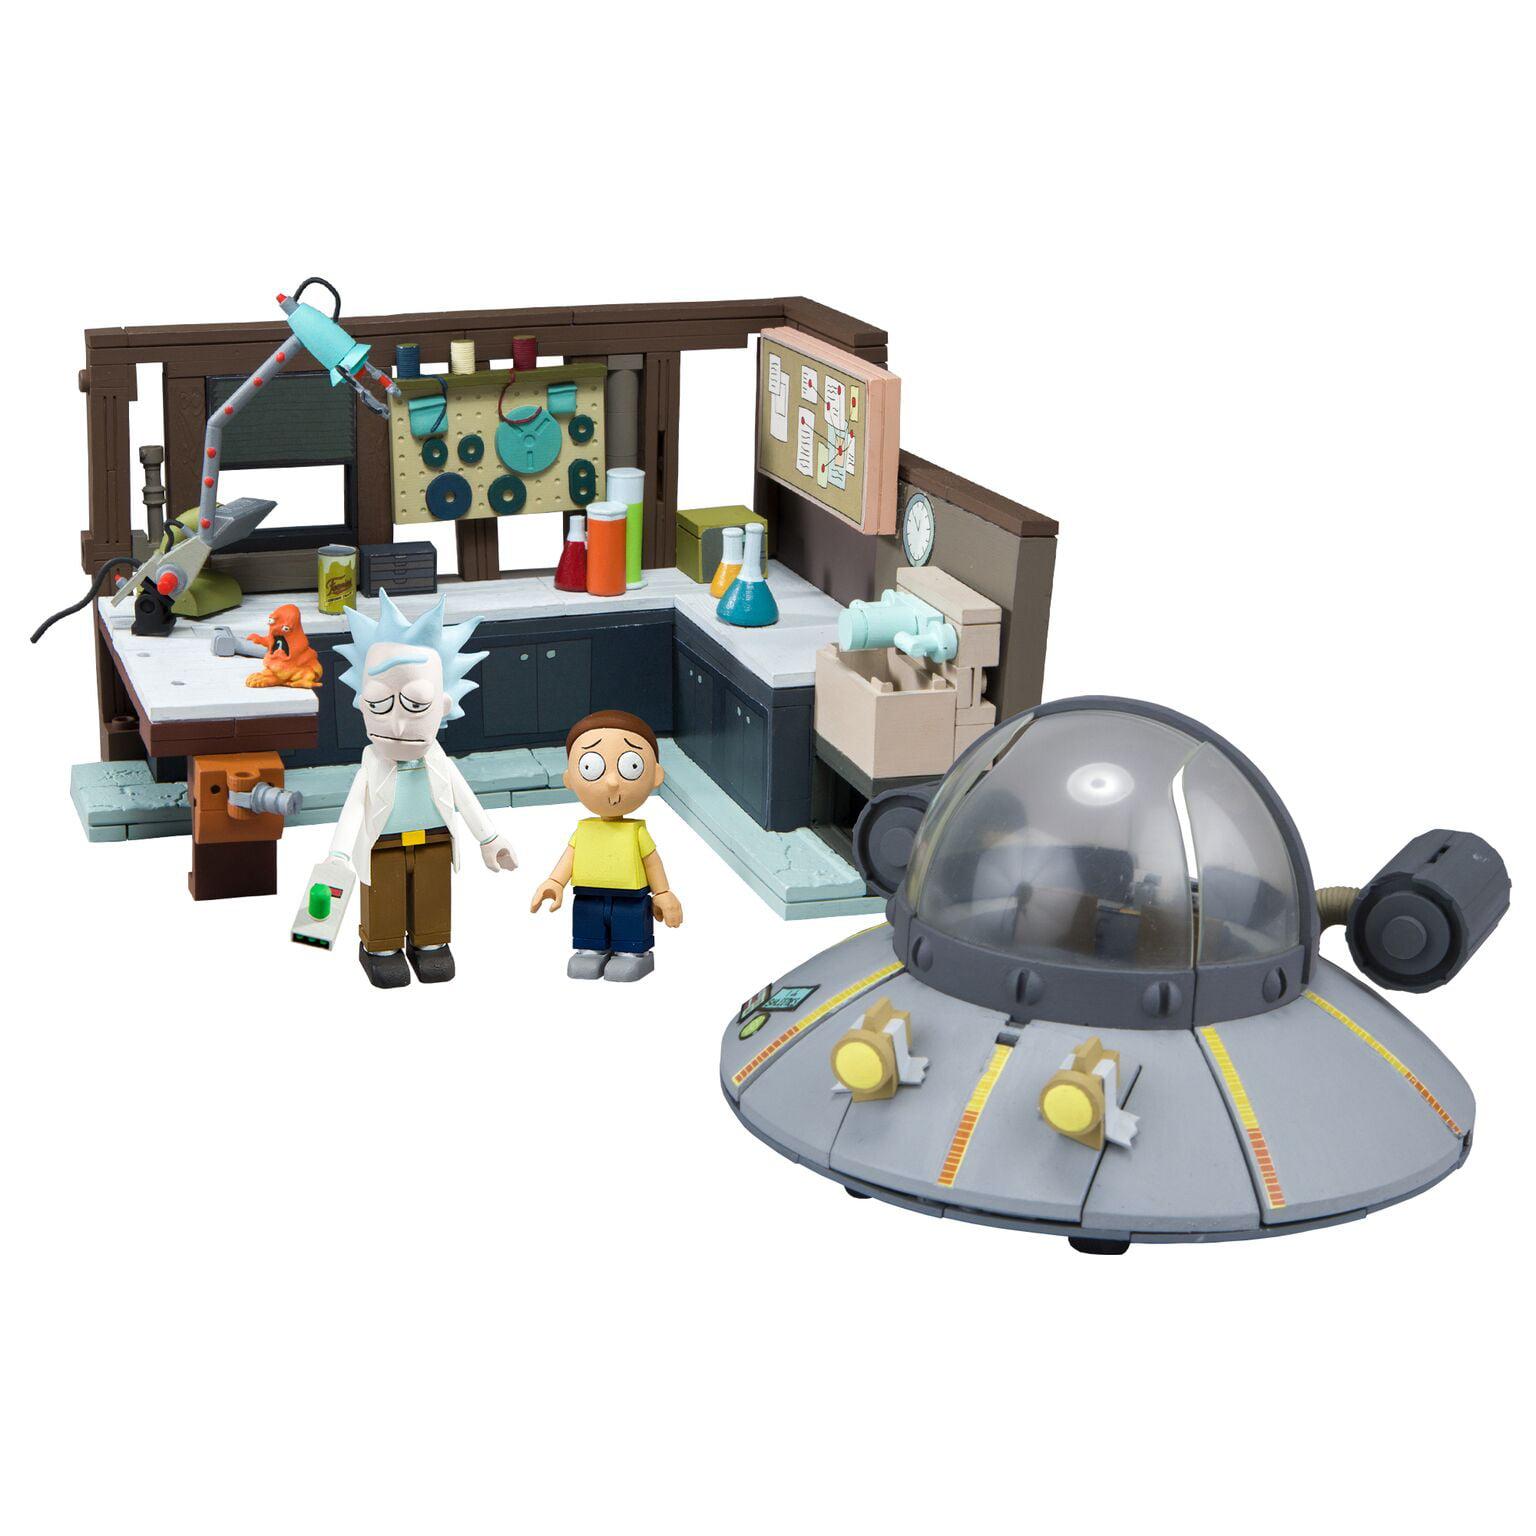 Mcfarlane Toys Rick /& Morty Garage /& Spaceship Construction Sets